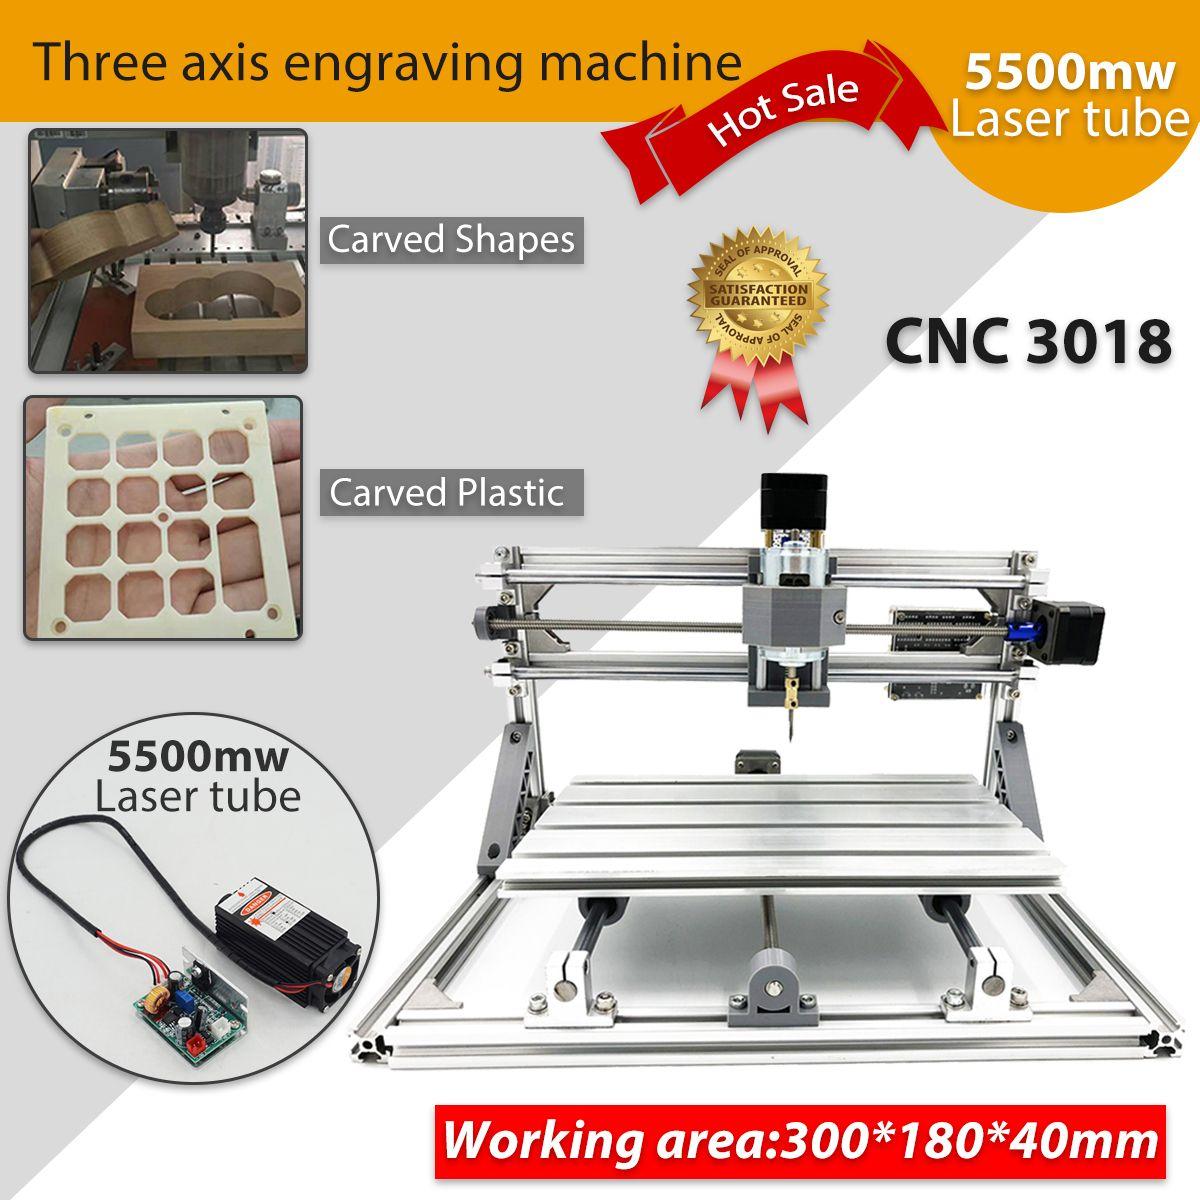 CNC 3018 5500 mw/2500 mw Laser mini cnc gravur maschine cnc fräsmaschine cnc kit Holz Router